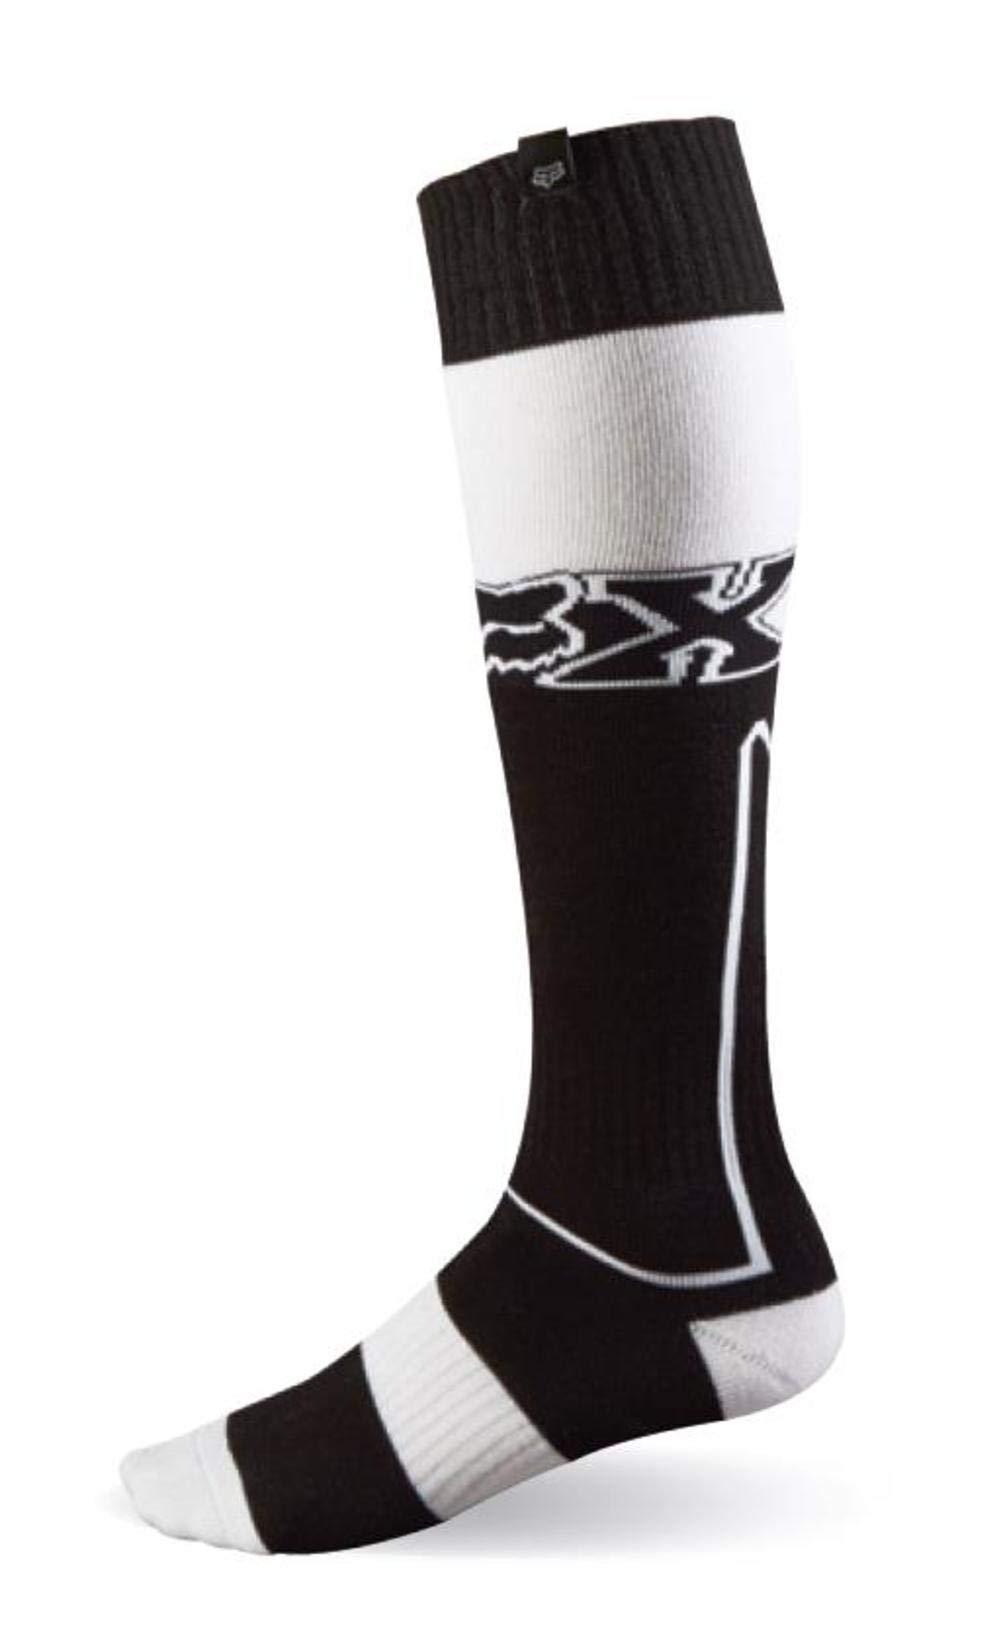 Fox Racing Fri Imperial Thick Men's MX Motorcycle Socks - Black/White/Small